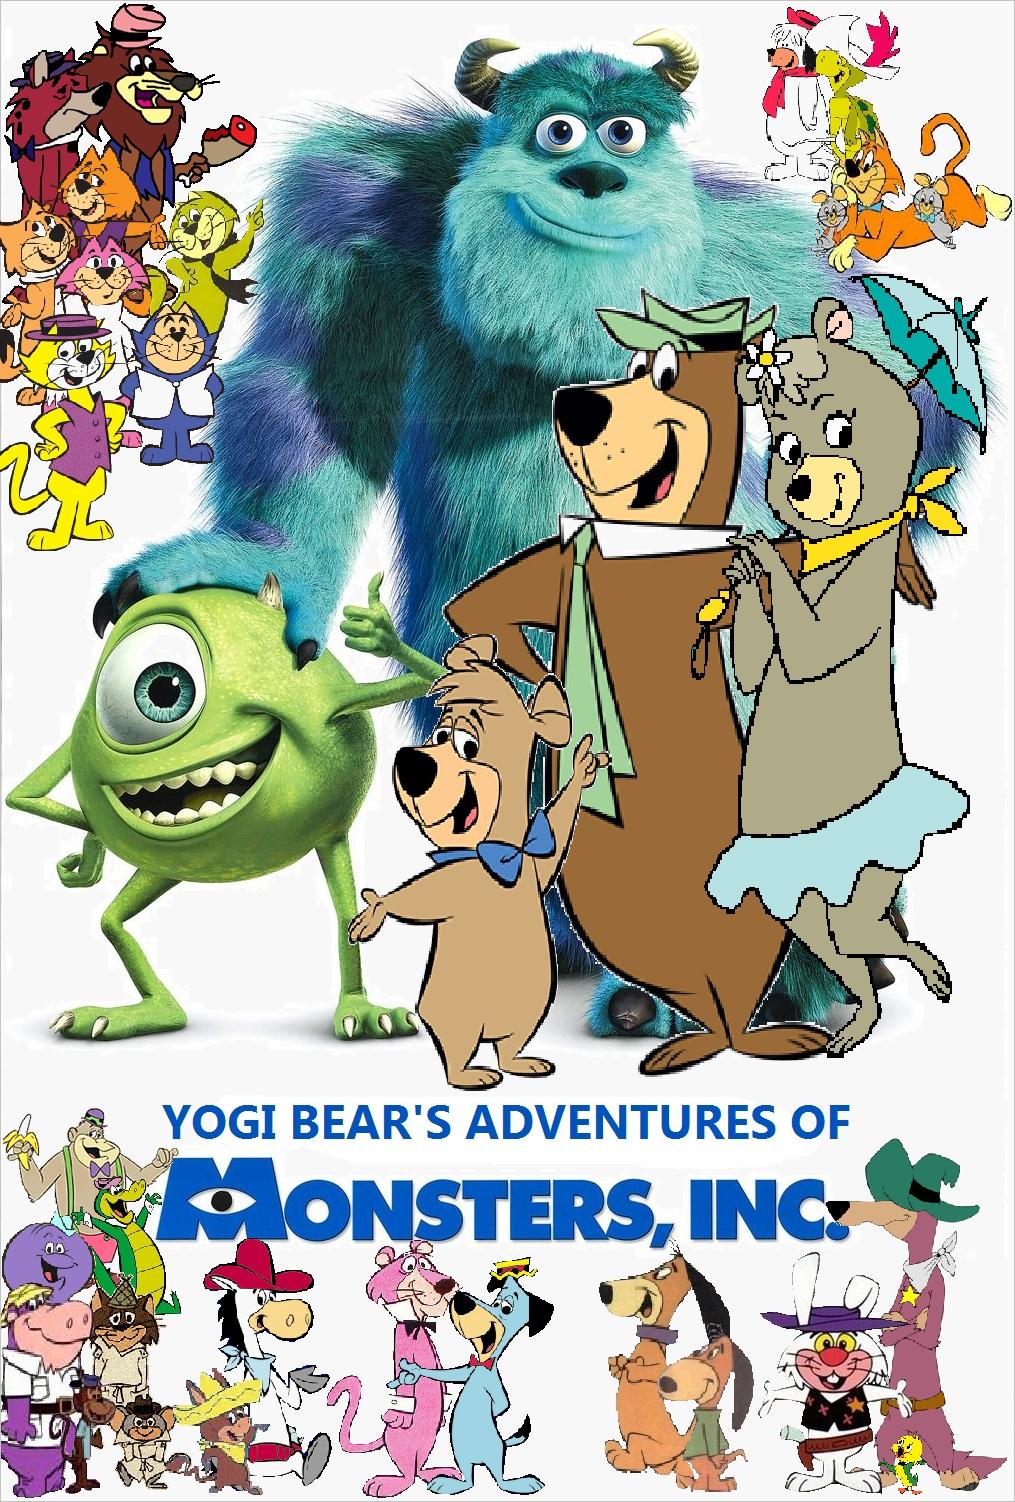 Yogi Bearu0026#39;s Adventures of Monsters, Inc. : Poohu0026#39;s ...